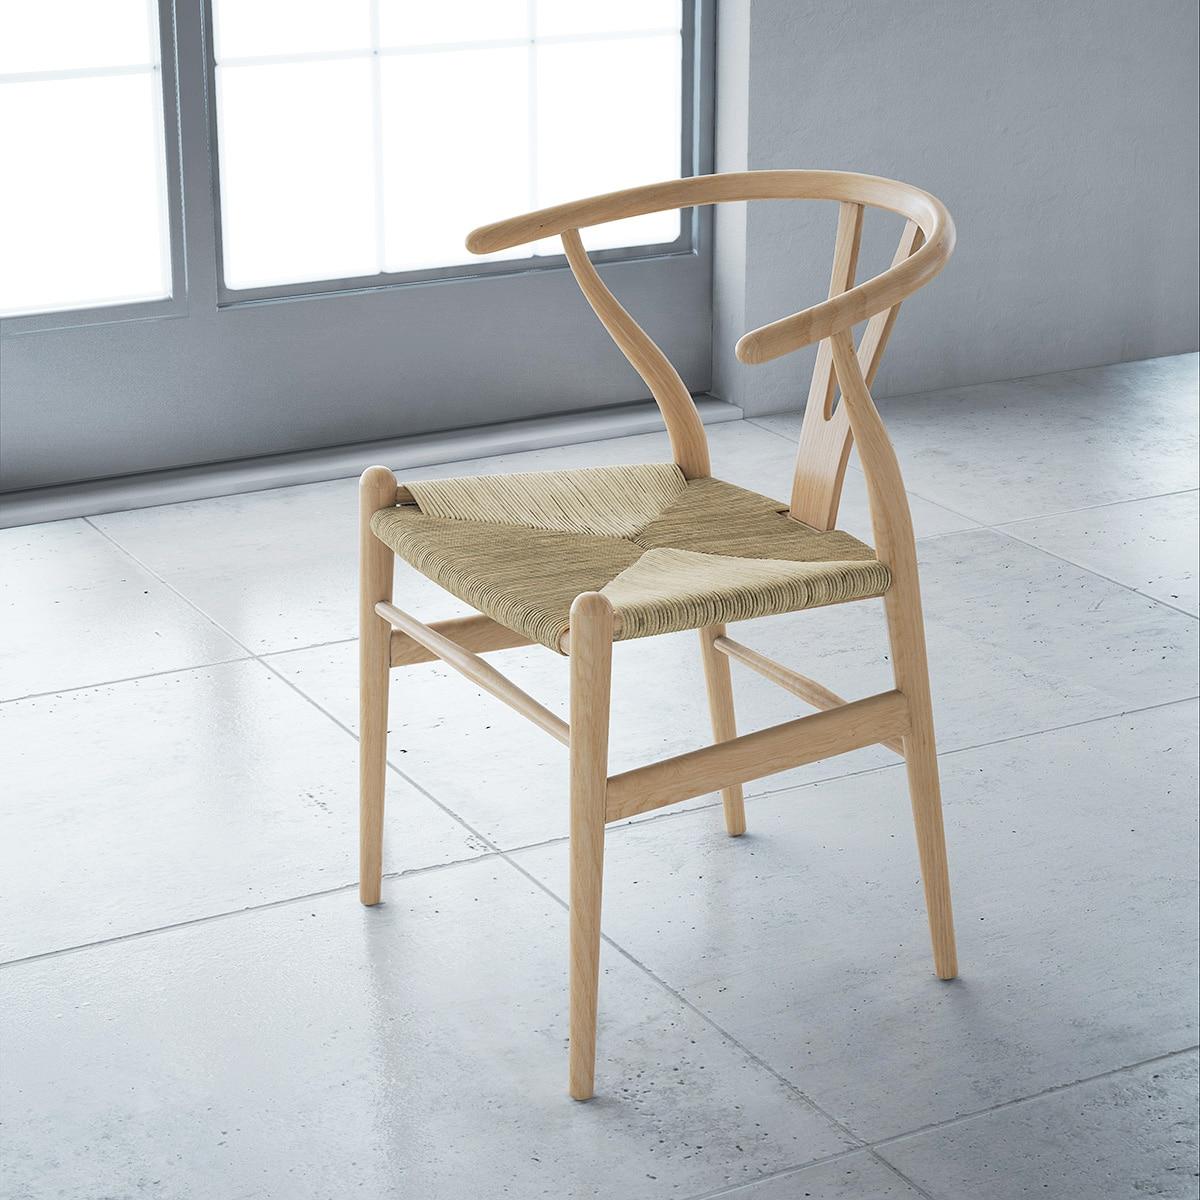 Wishbone Chair - UE4Arch